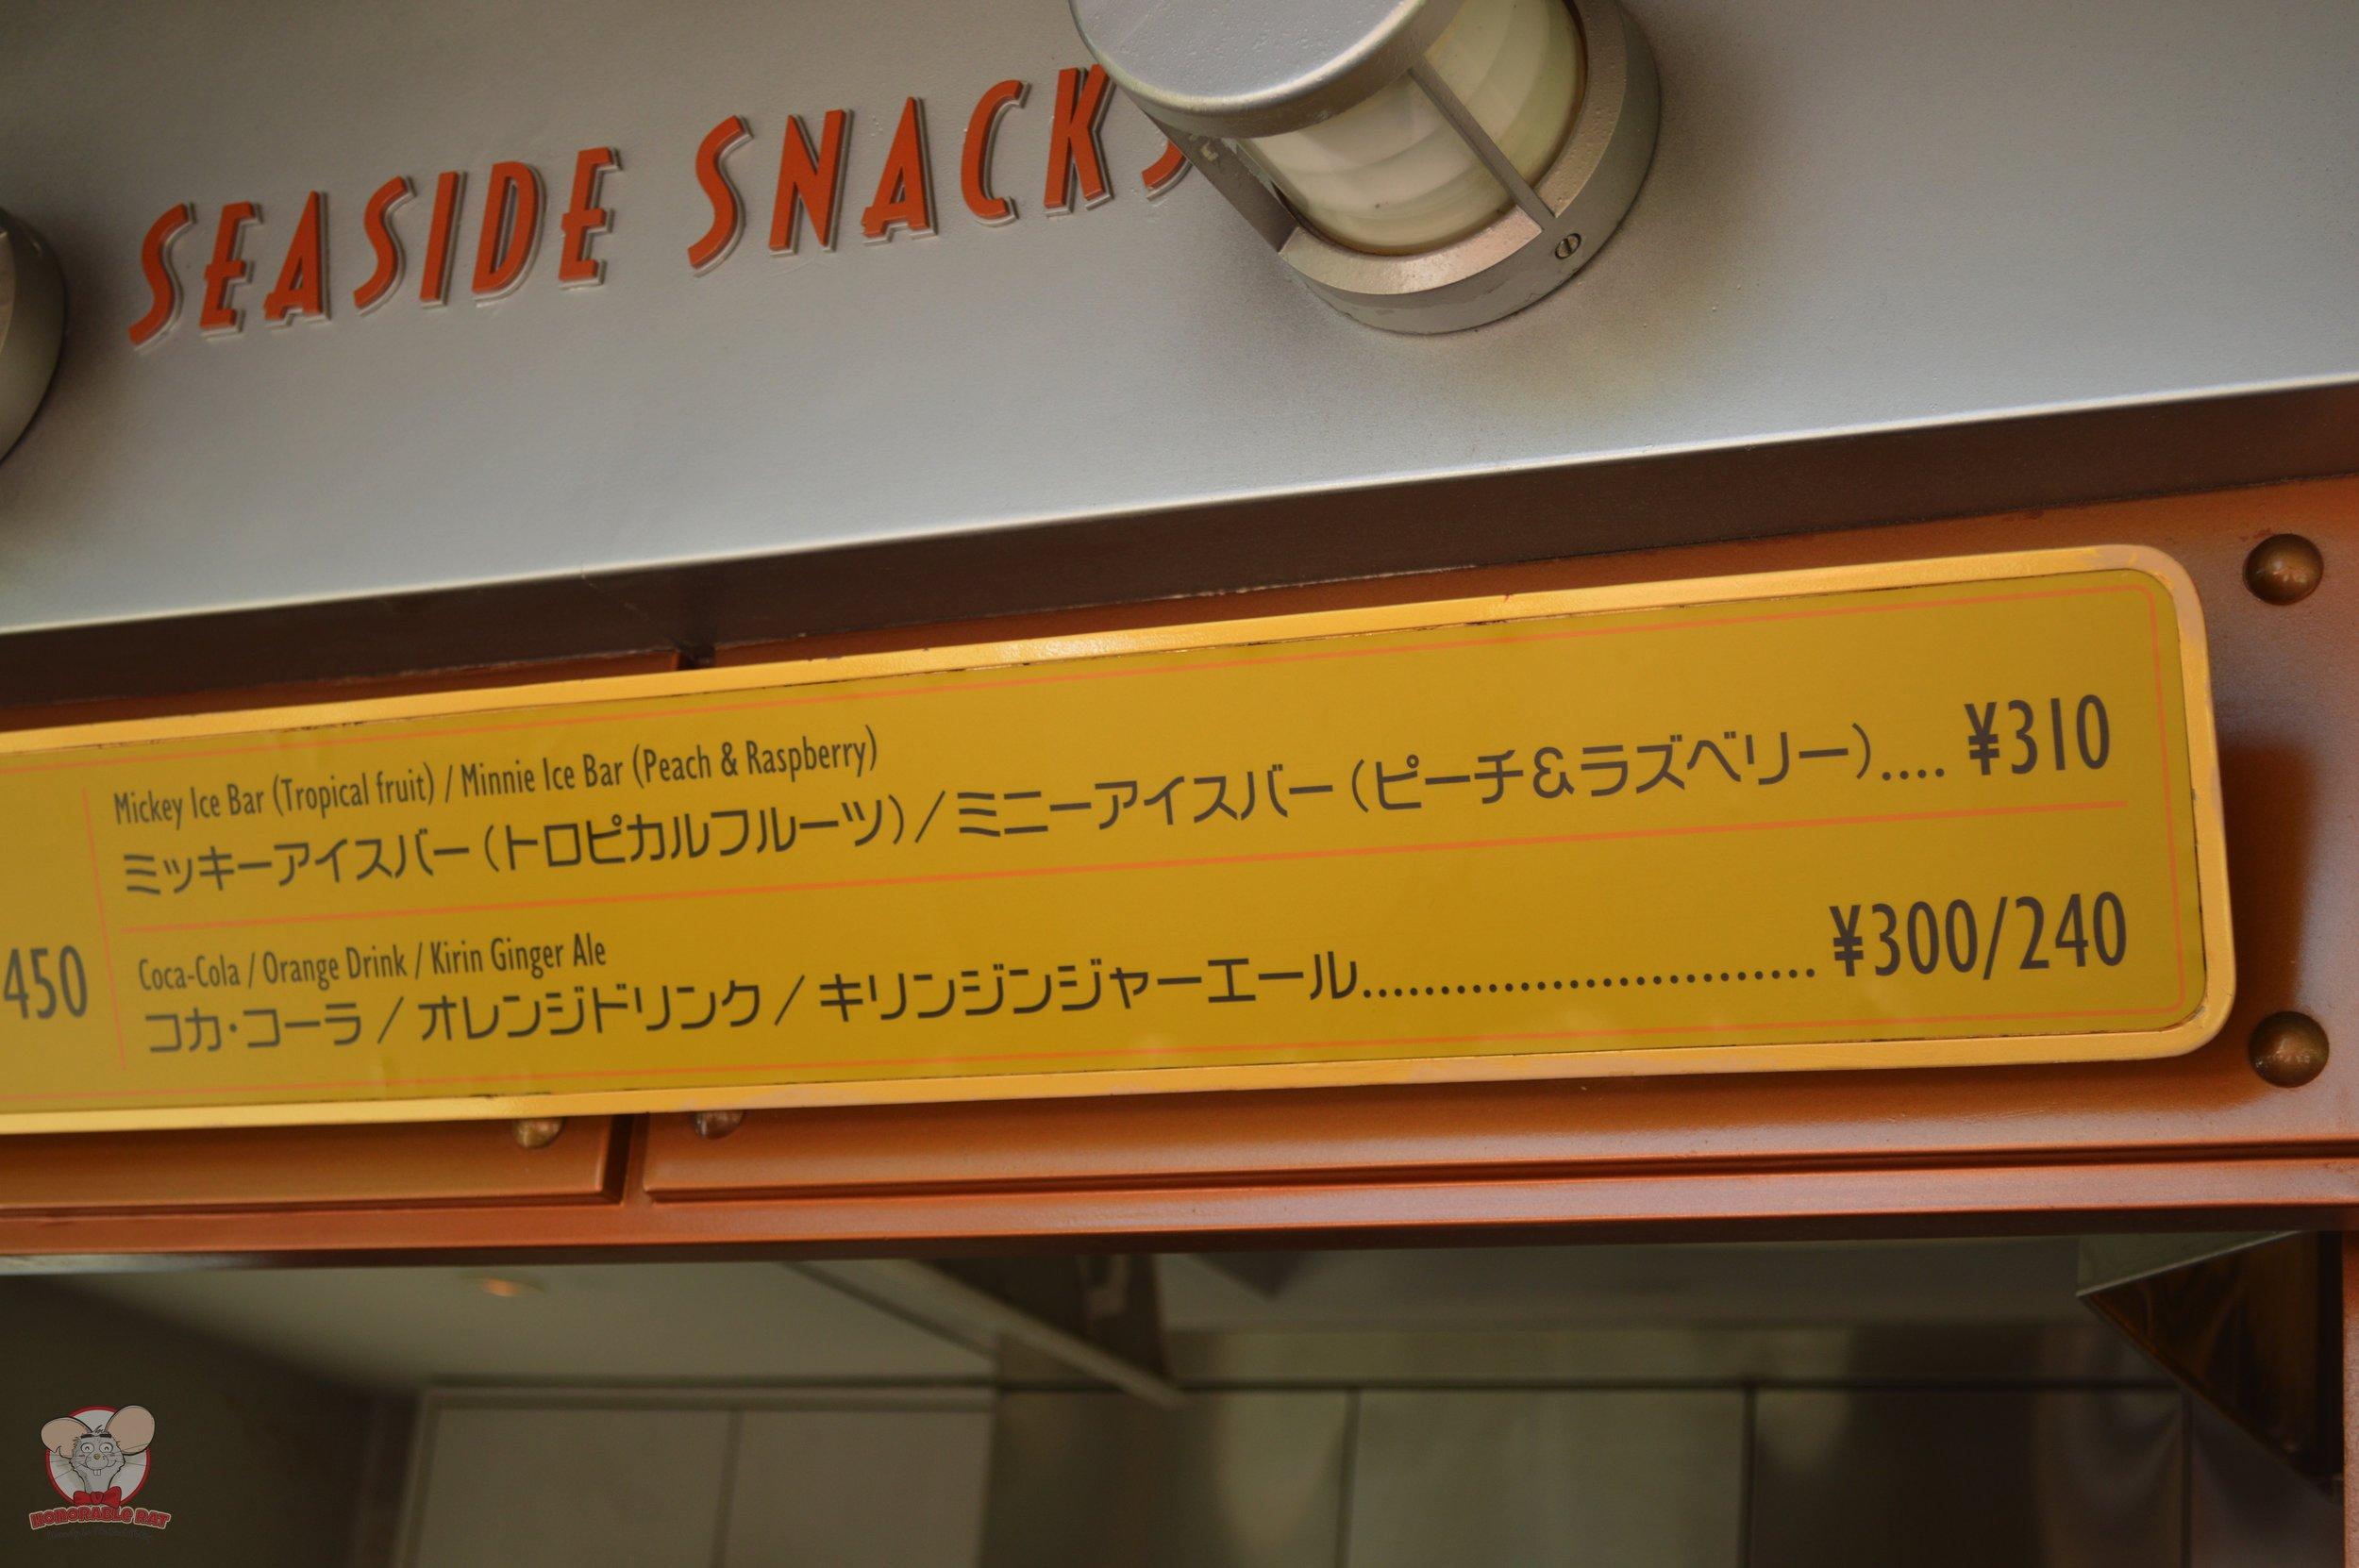 310 yen for a Minnie Ice Bar